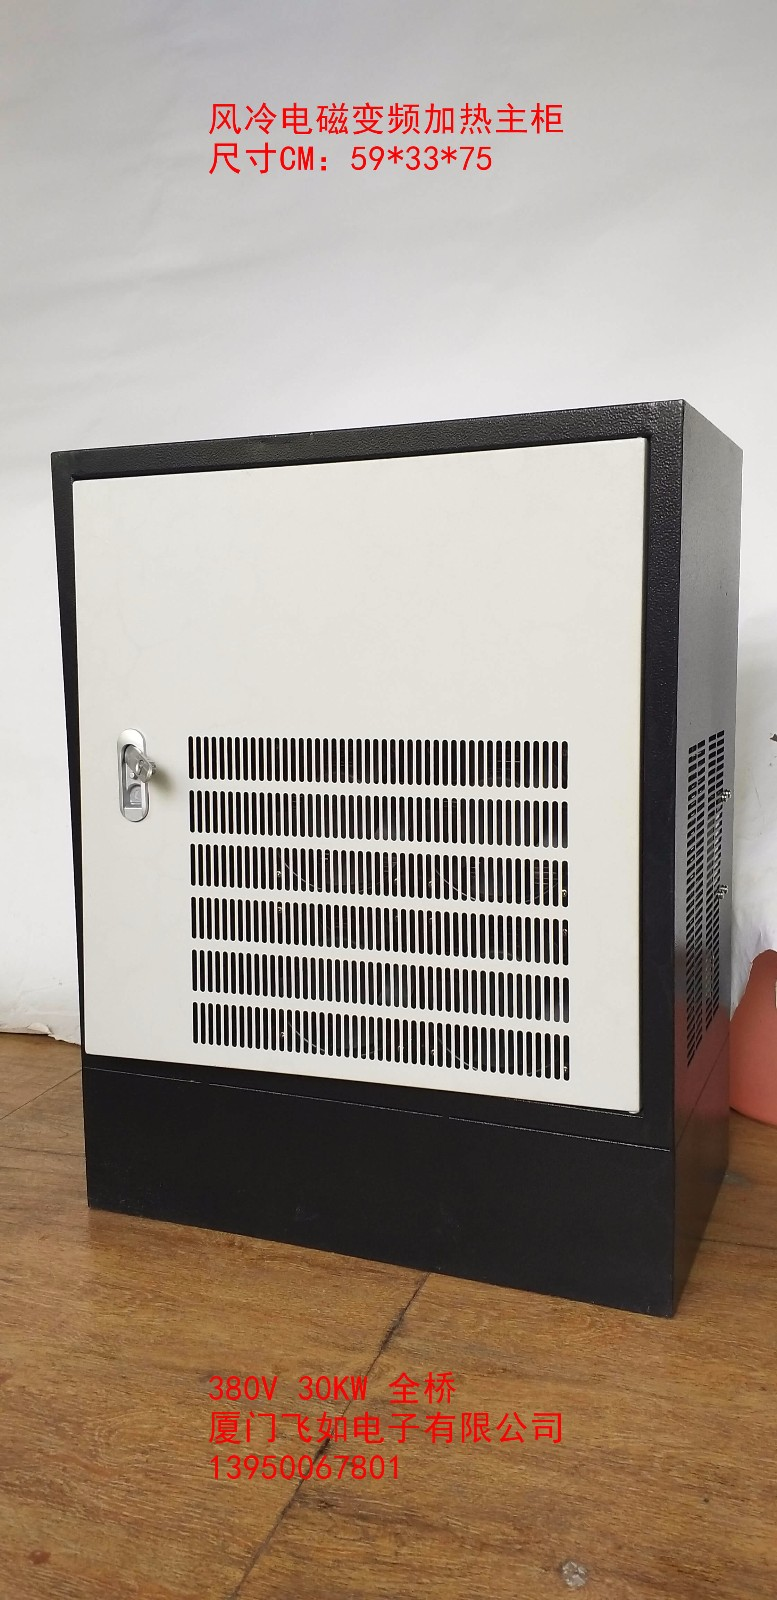 电磁加热机柜30KW